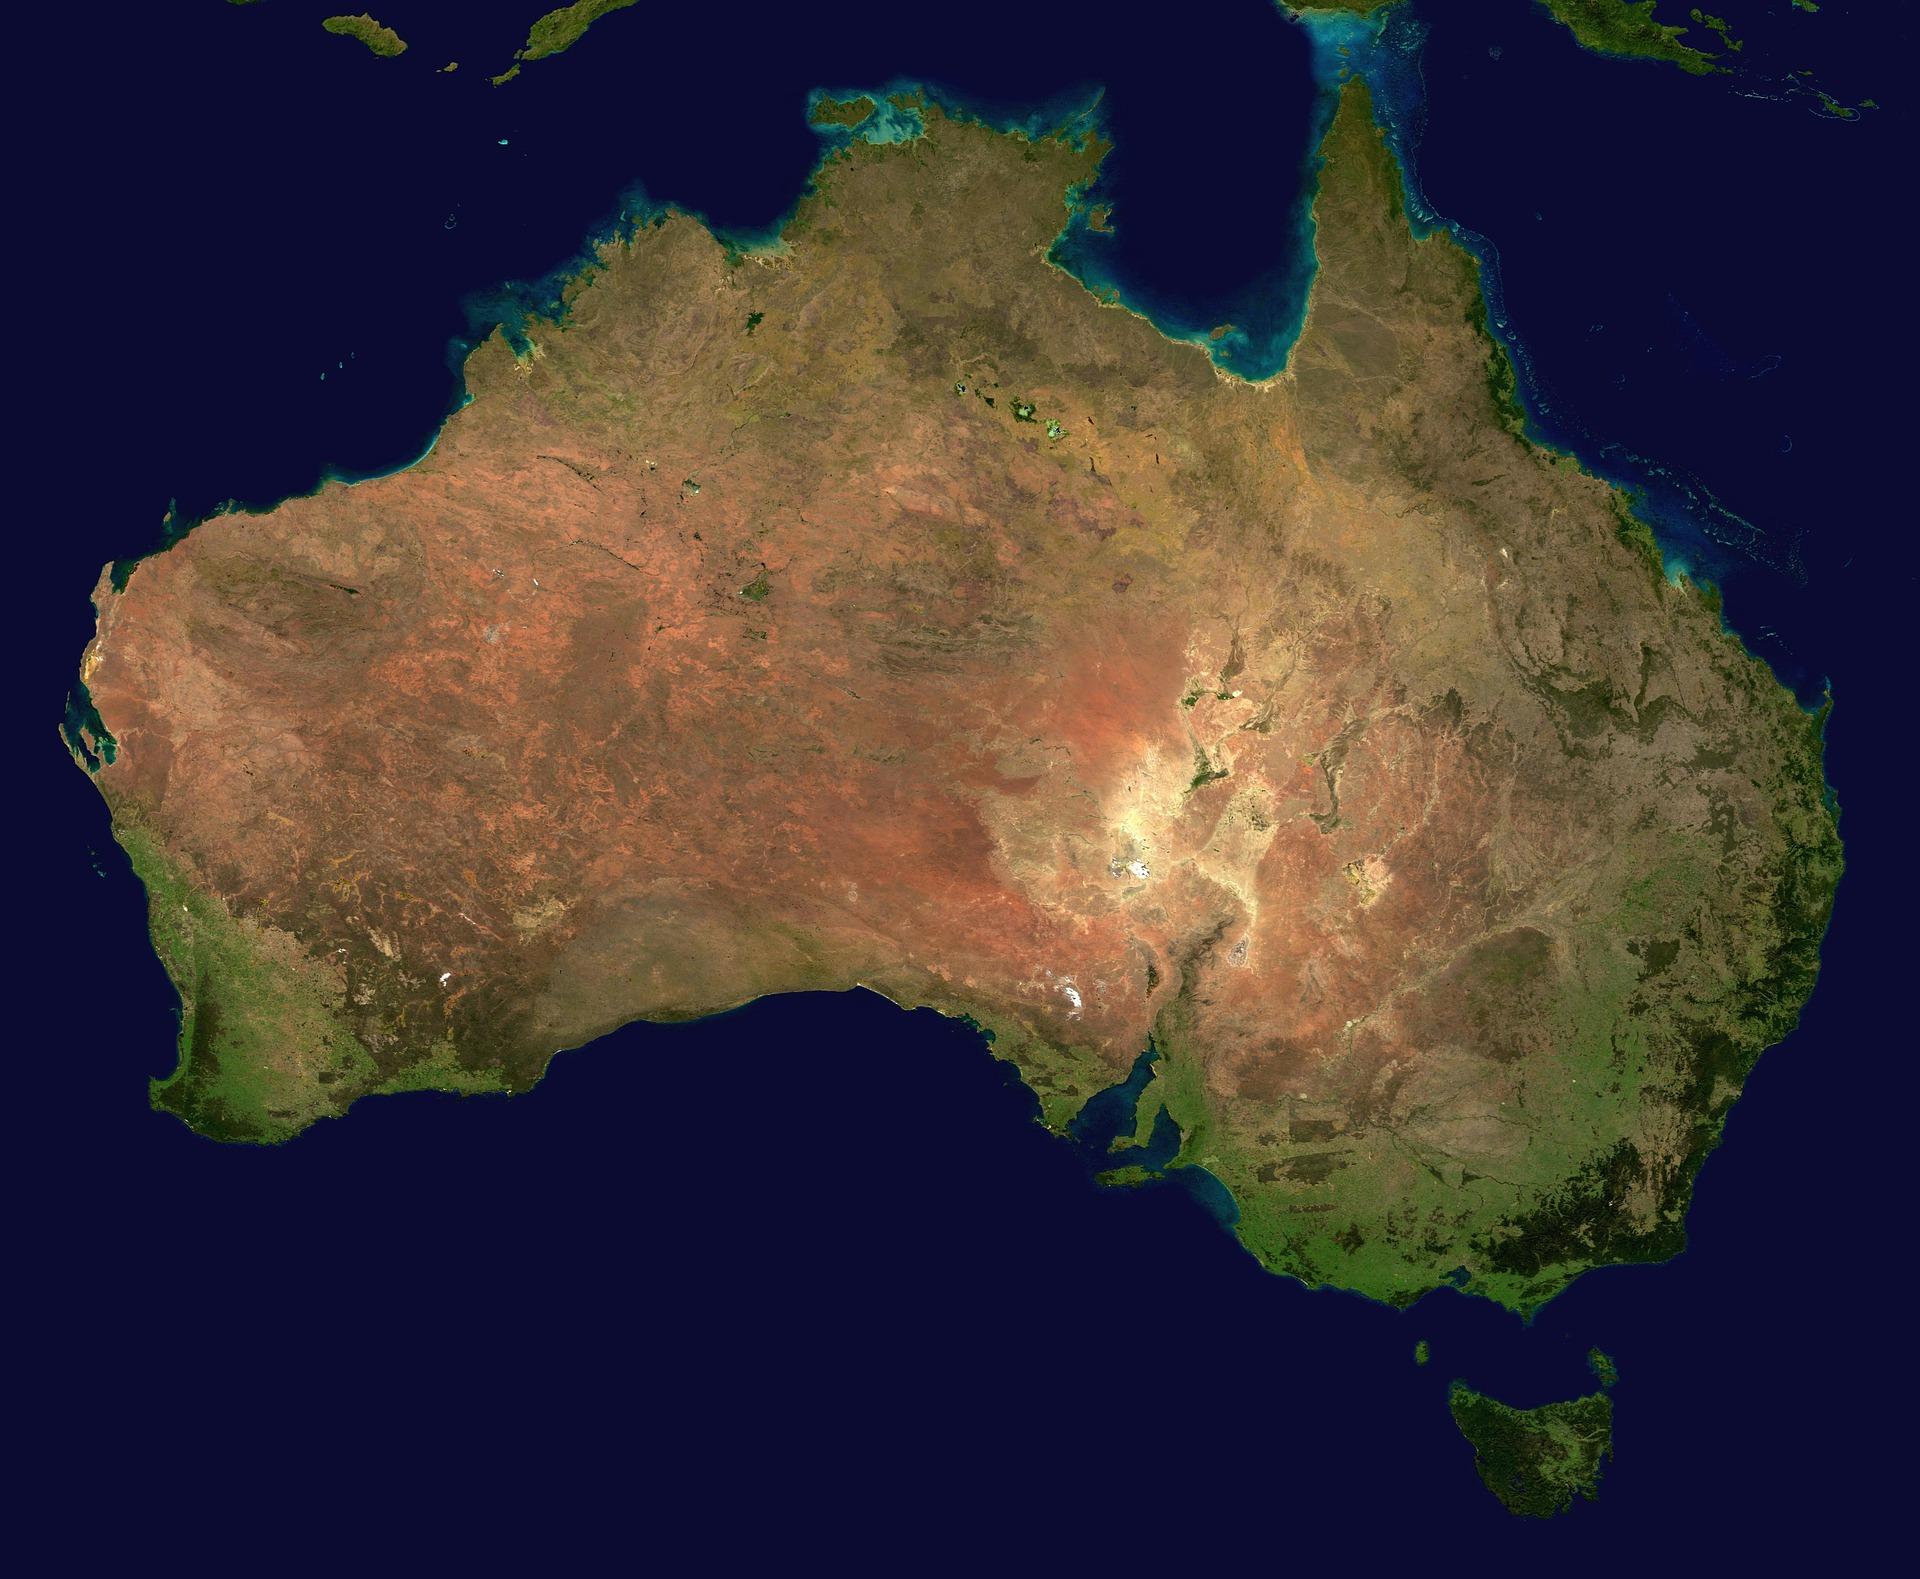 Aussie online gambling operators support credit card ban